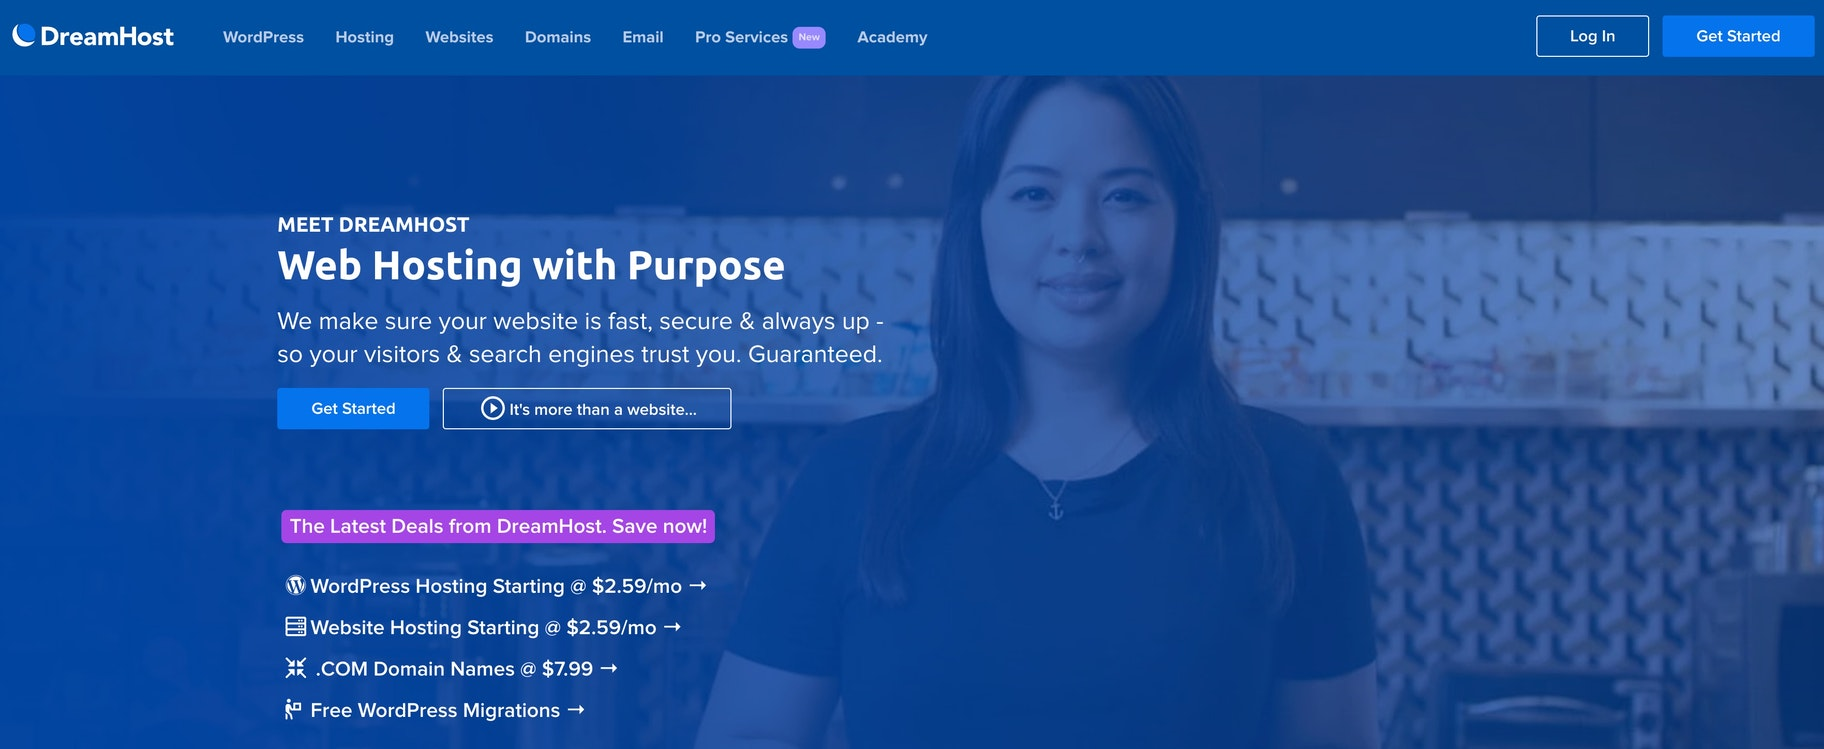 easy-to-use hosting platform: Dreamhost